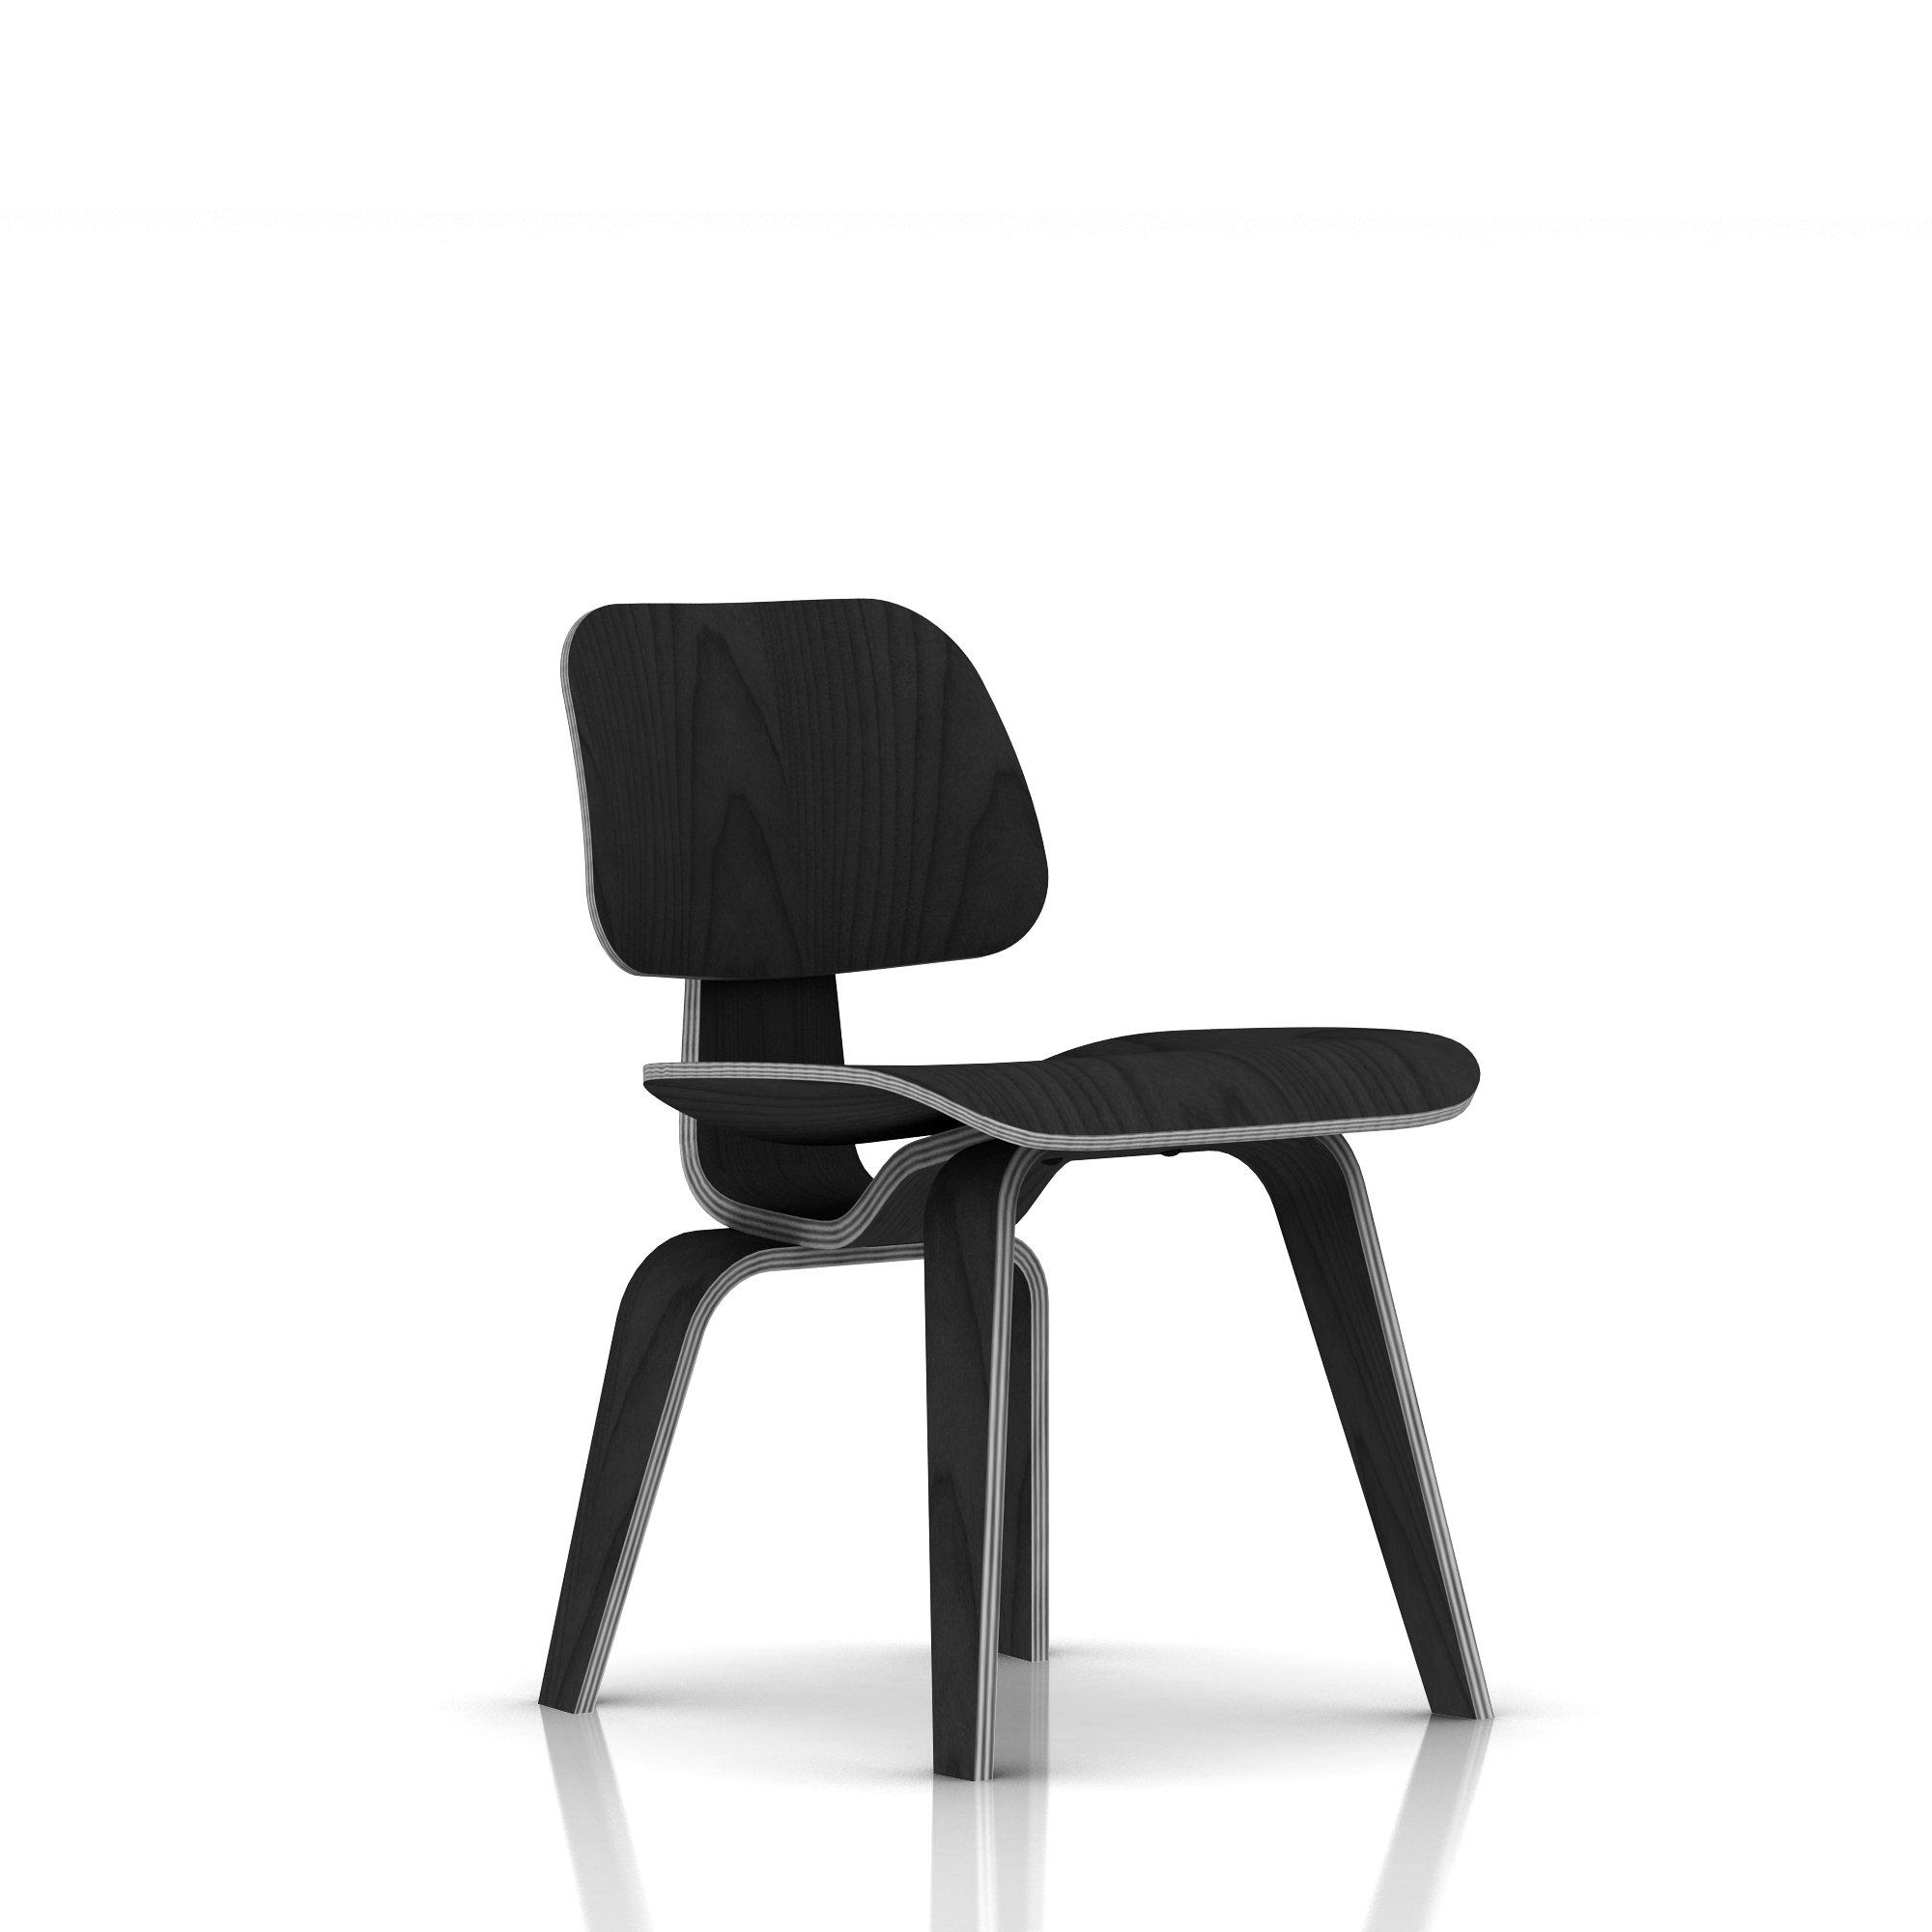 herman miller eames molded plywood dining chair wood legs gr shop canada. Black Bedroom Furniture Sets. Home Design Ideas